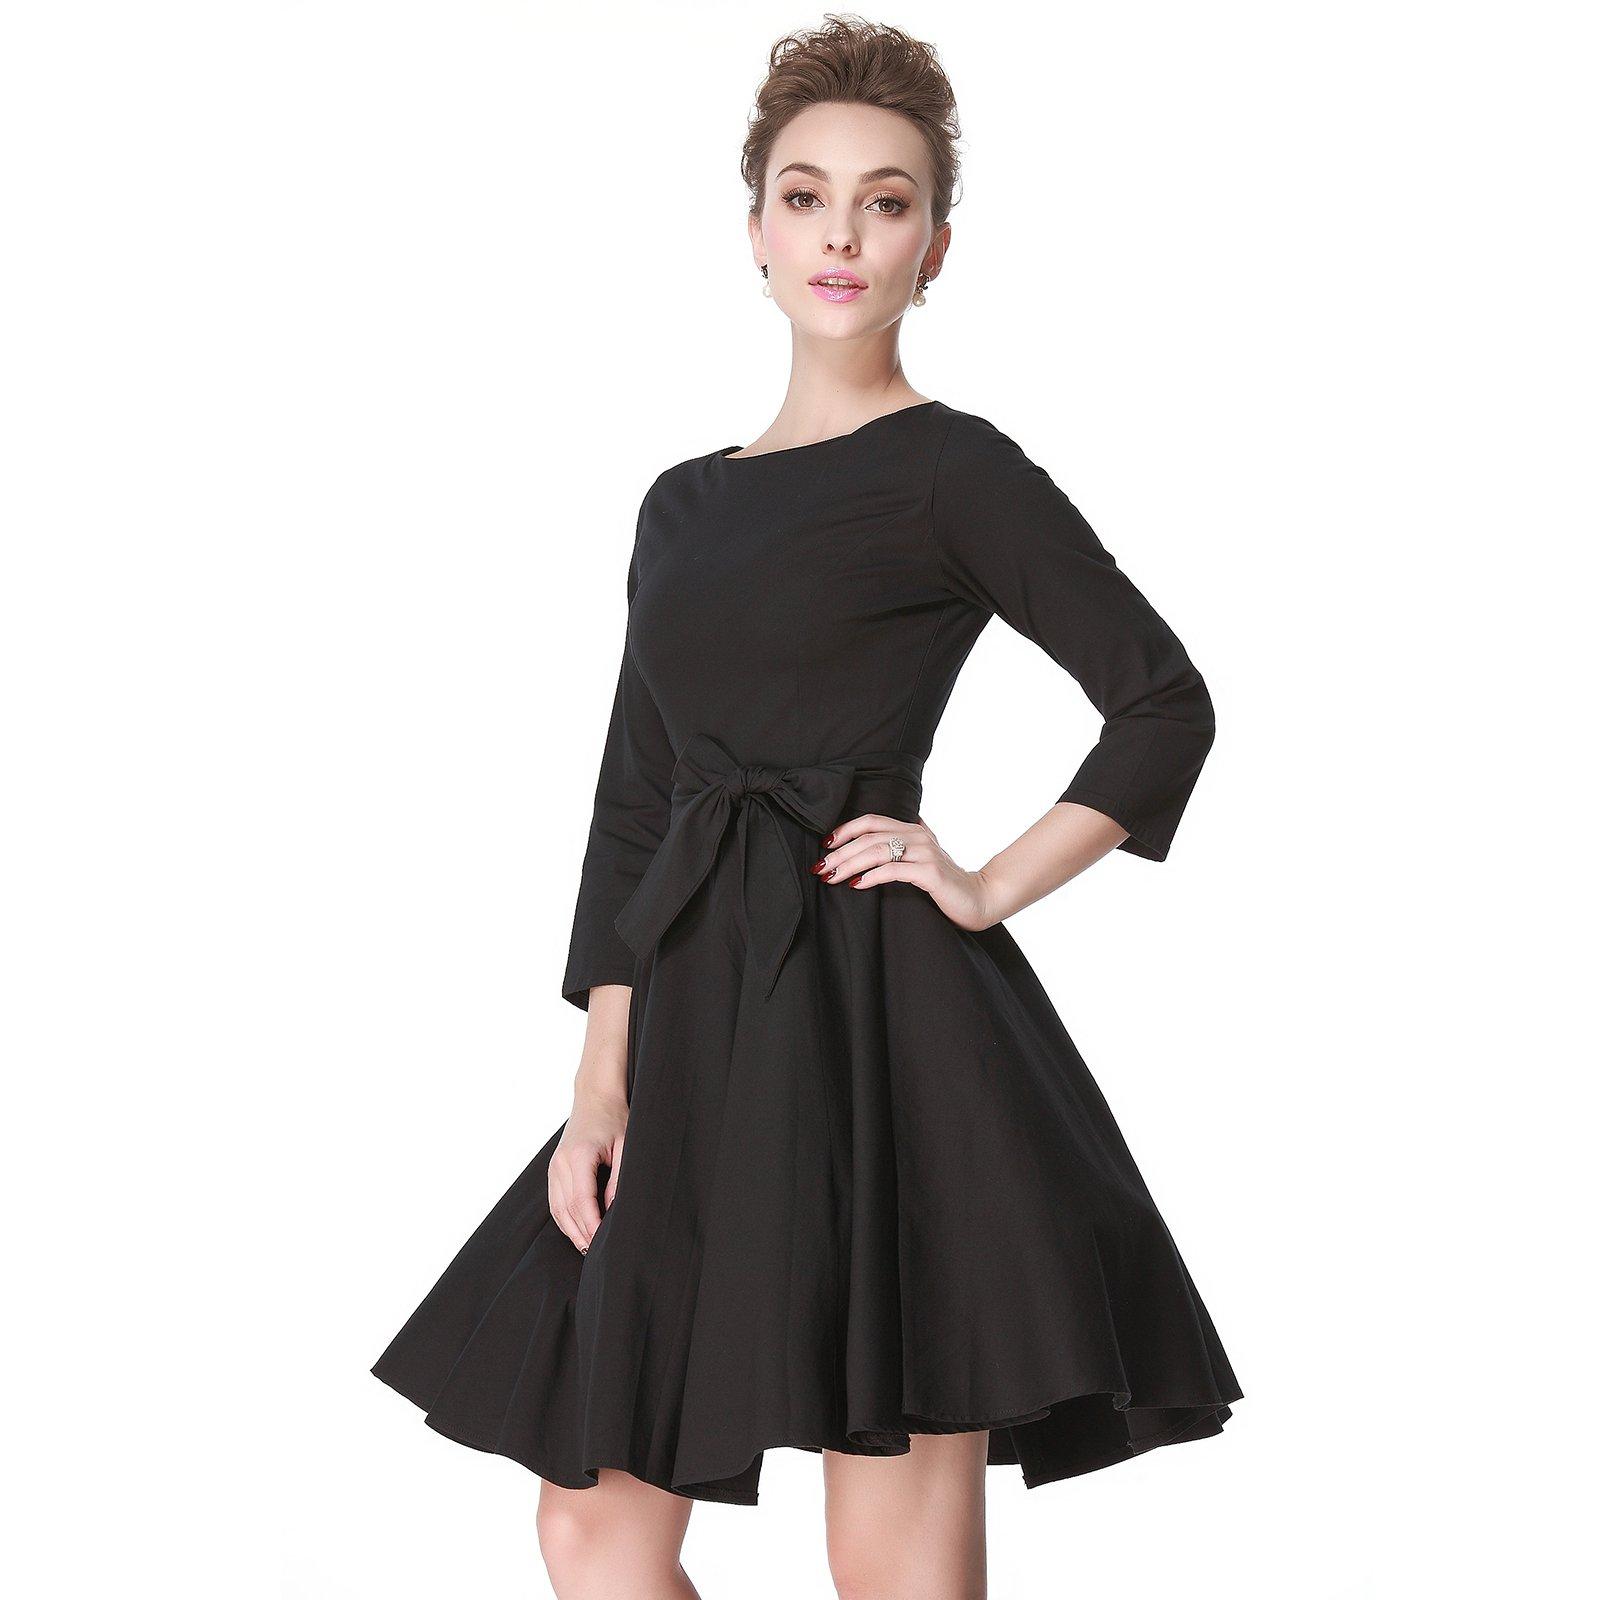 Heroecol 50s 60s Hepburn 3/4 Sleeve Style Vintage Retro Swing Rockailly Dresses Size XL Color Black by Heroecol (Image #4)